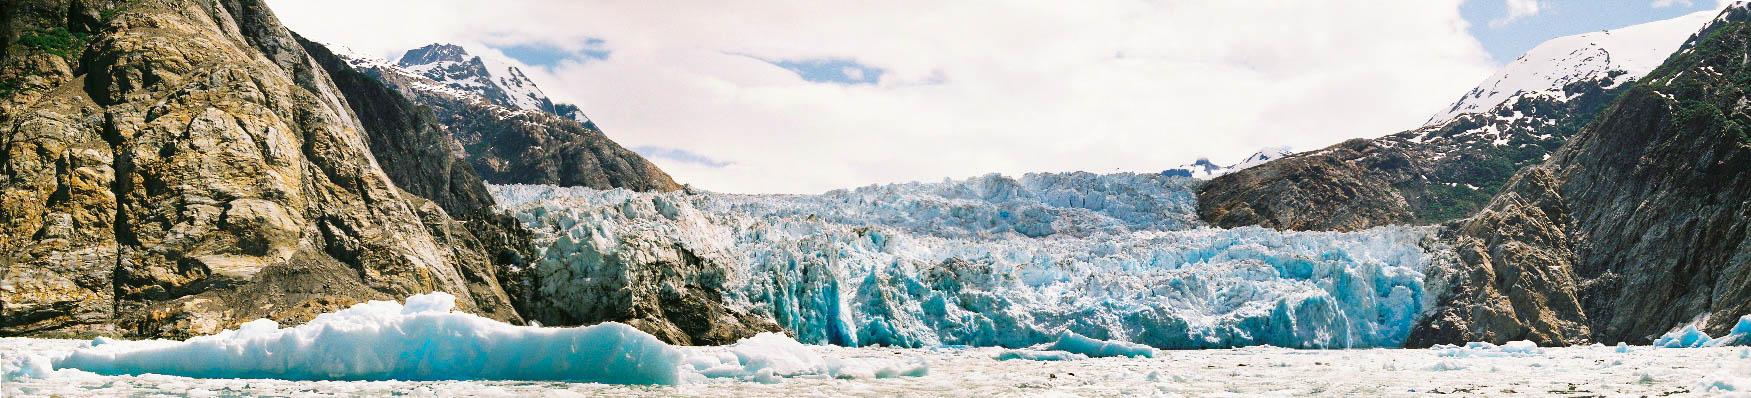 south sawyer glacier panorama 2